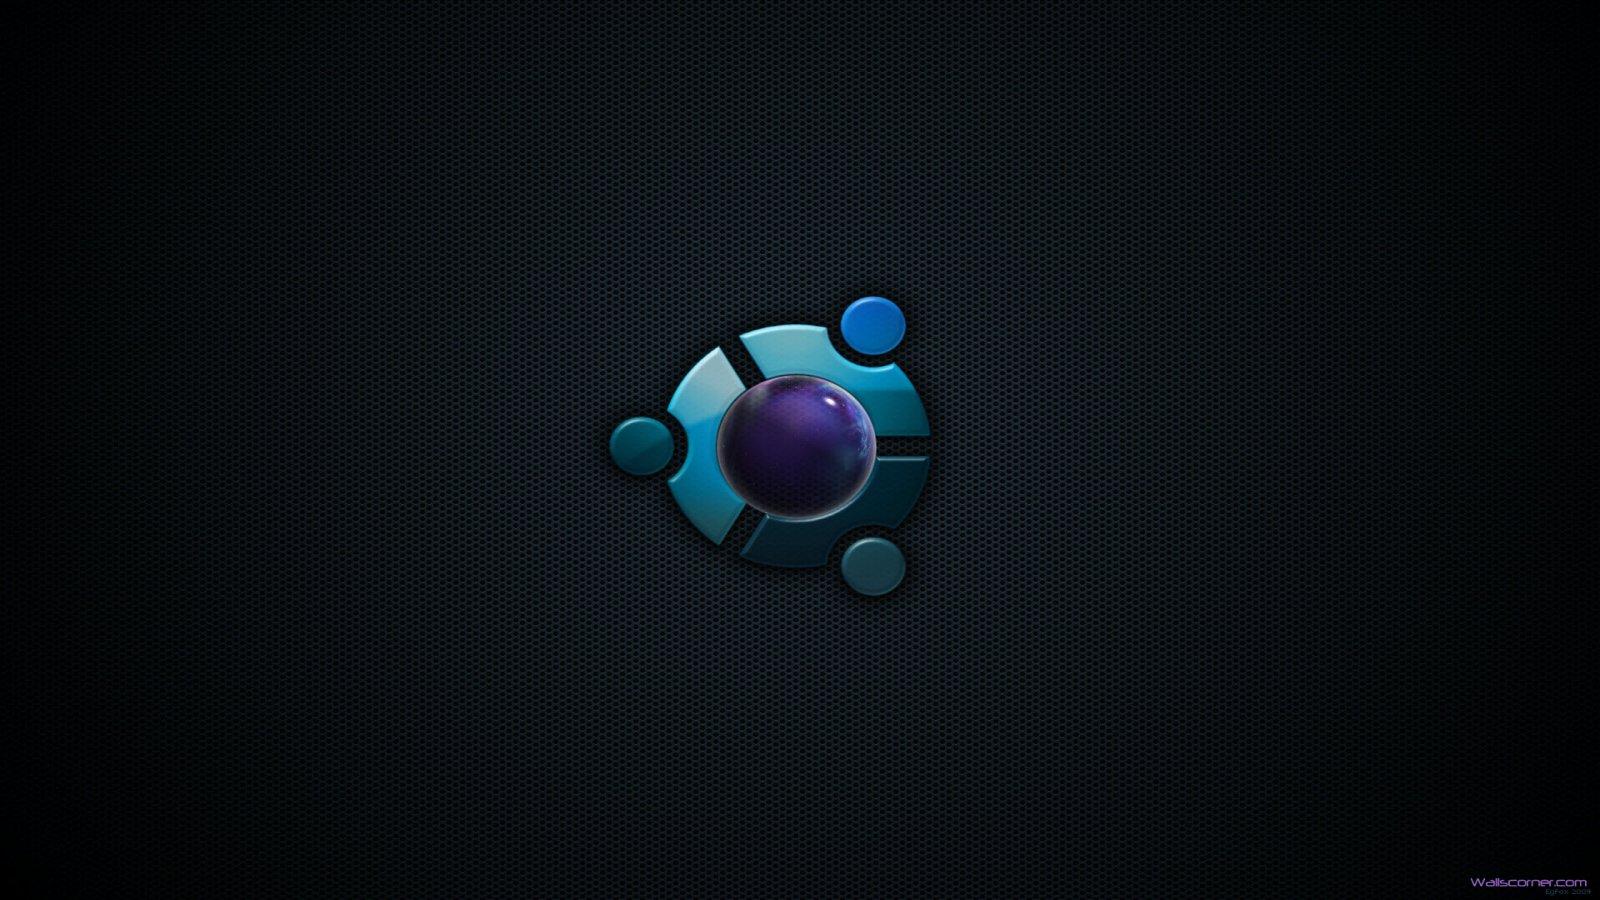 all other resolutions of ubuntu blue wide ubuntu blue wide wallpaper 1600x900